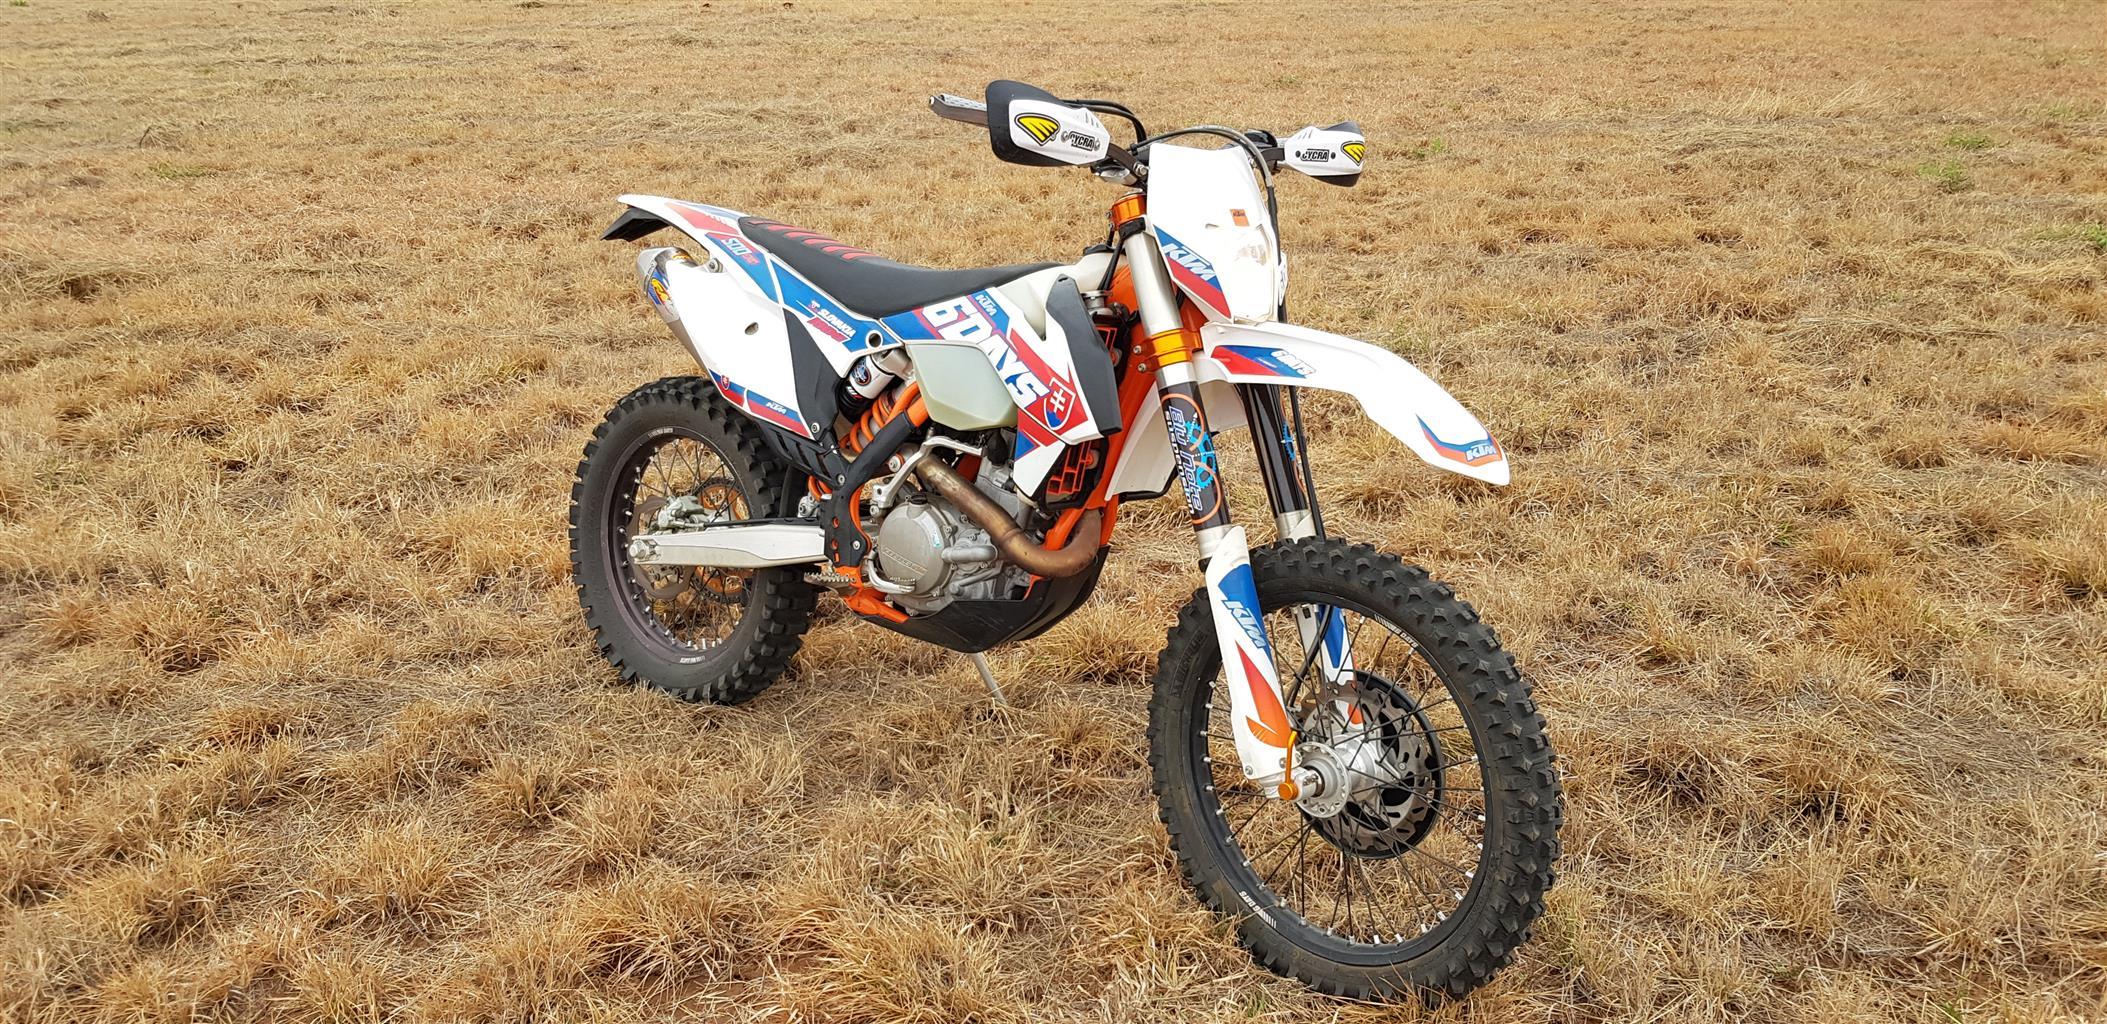 2016 KTM 450